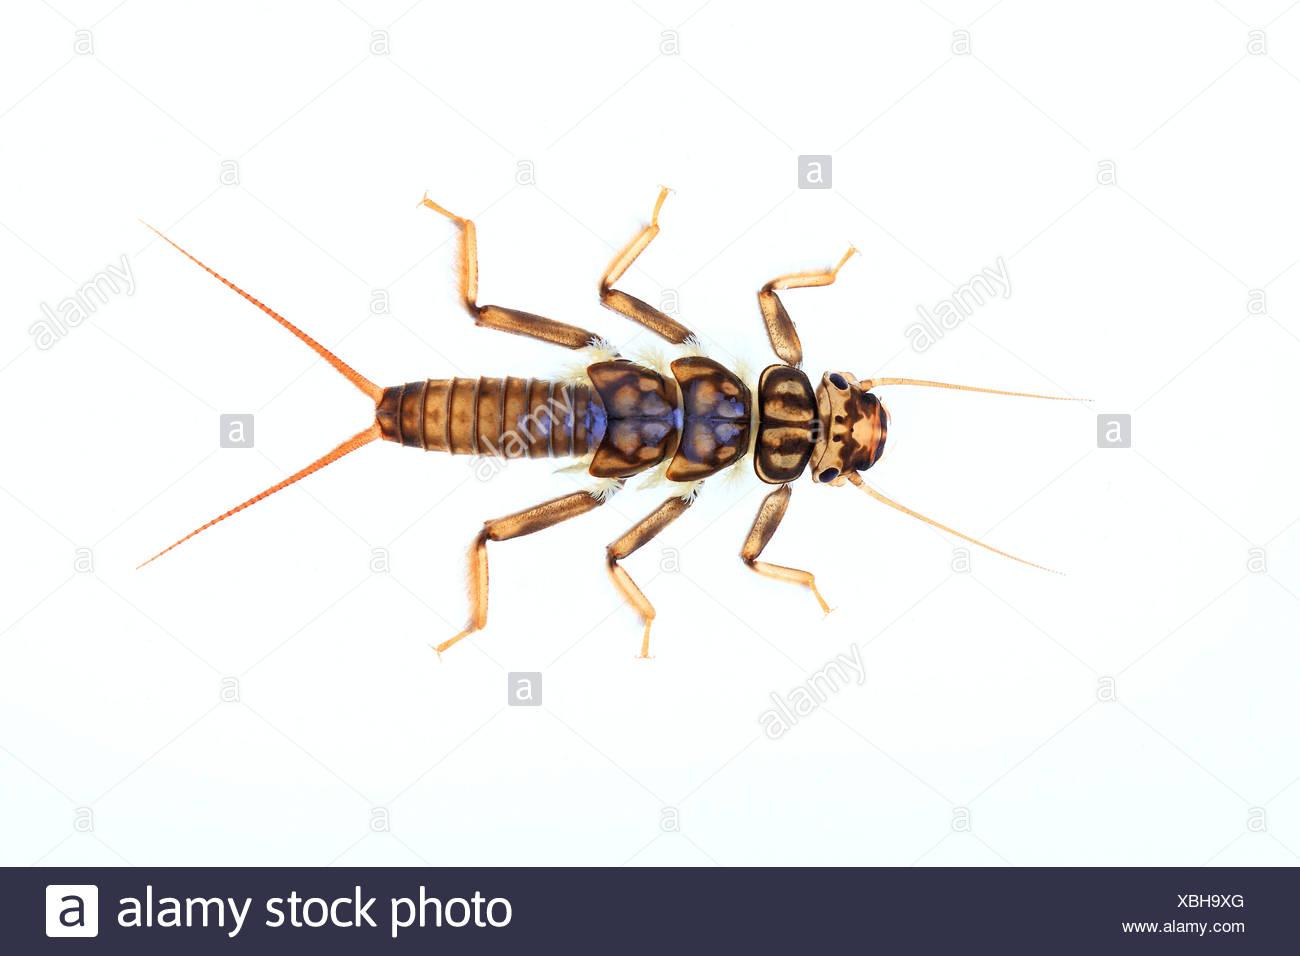 Larva of a Stonefly (Plecoptera), larva living under water - Stock Image